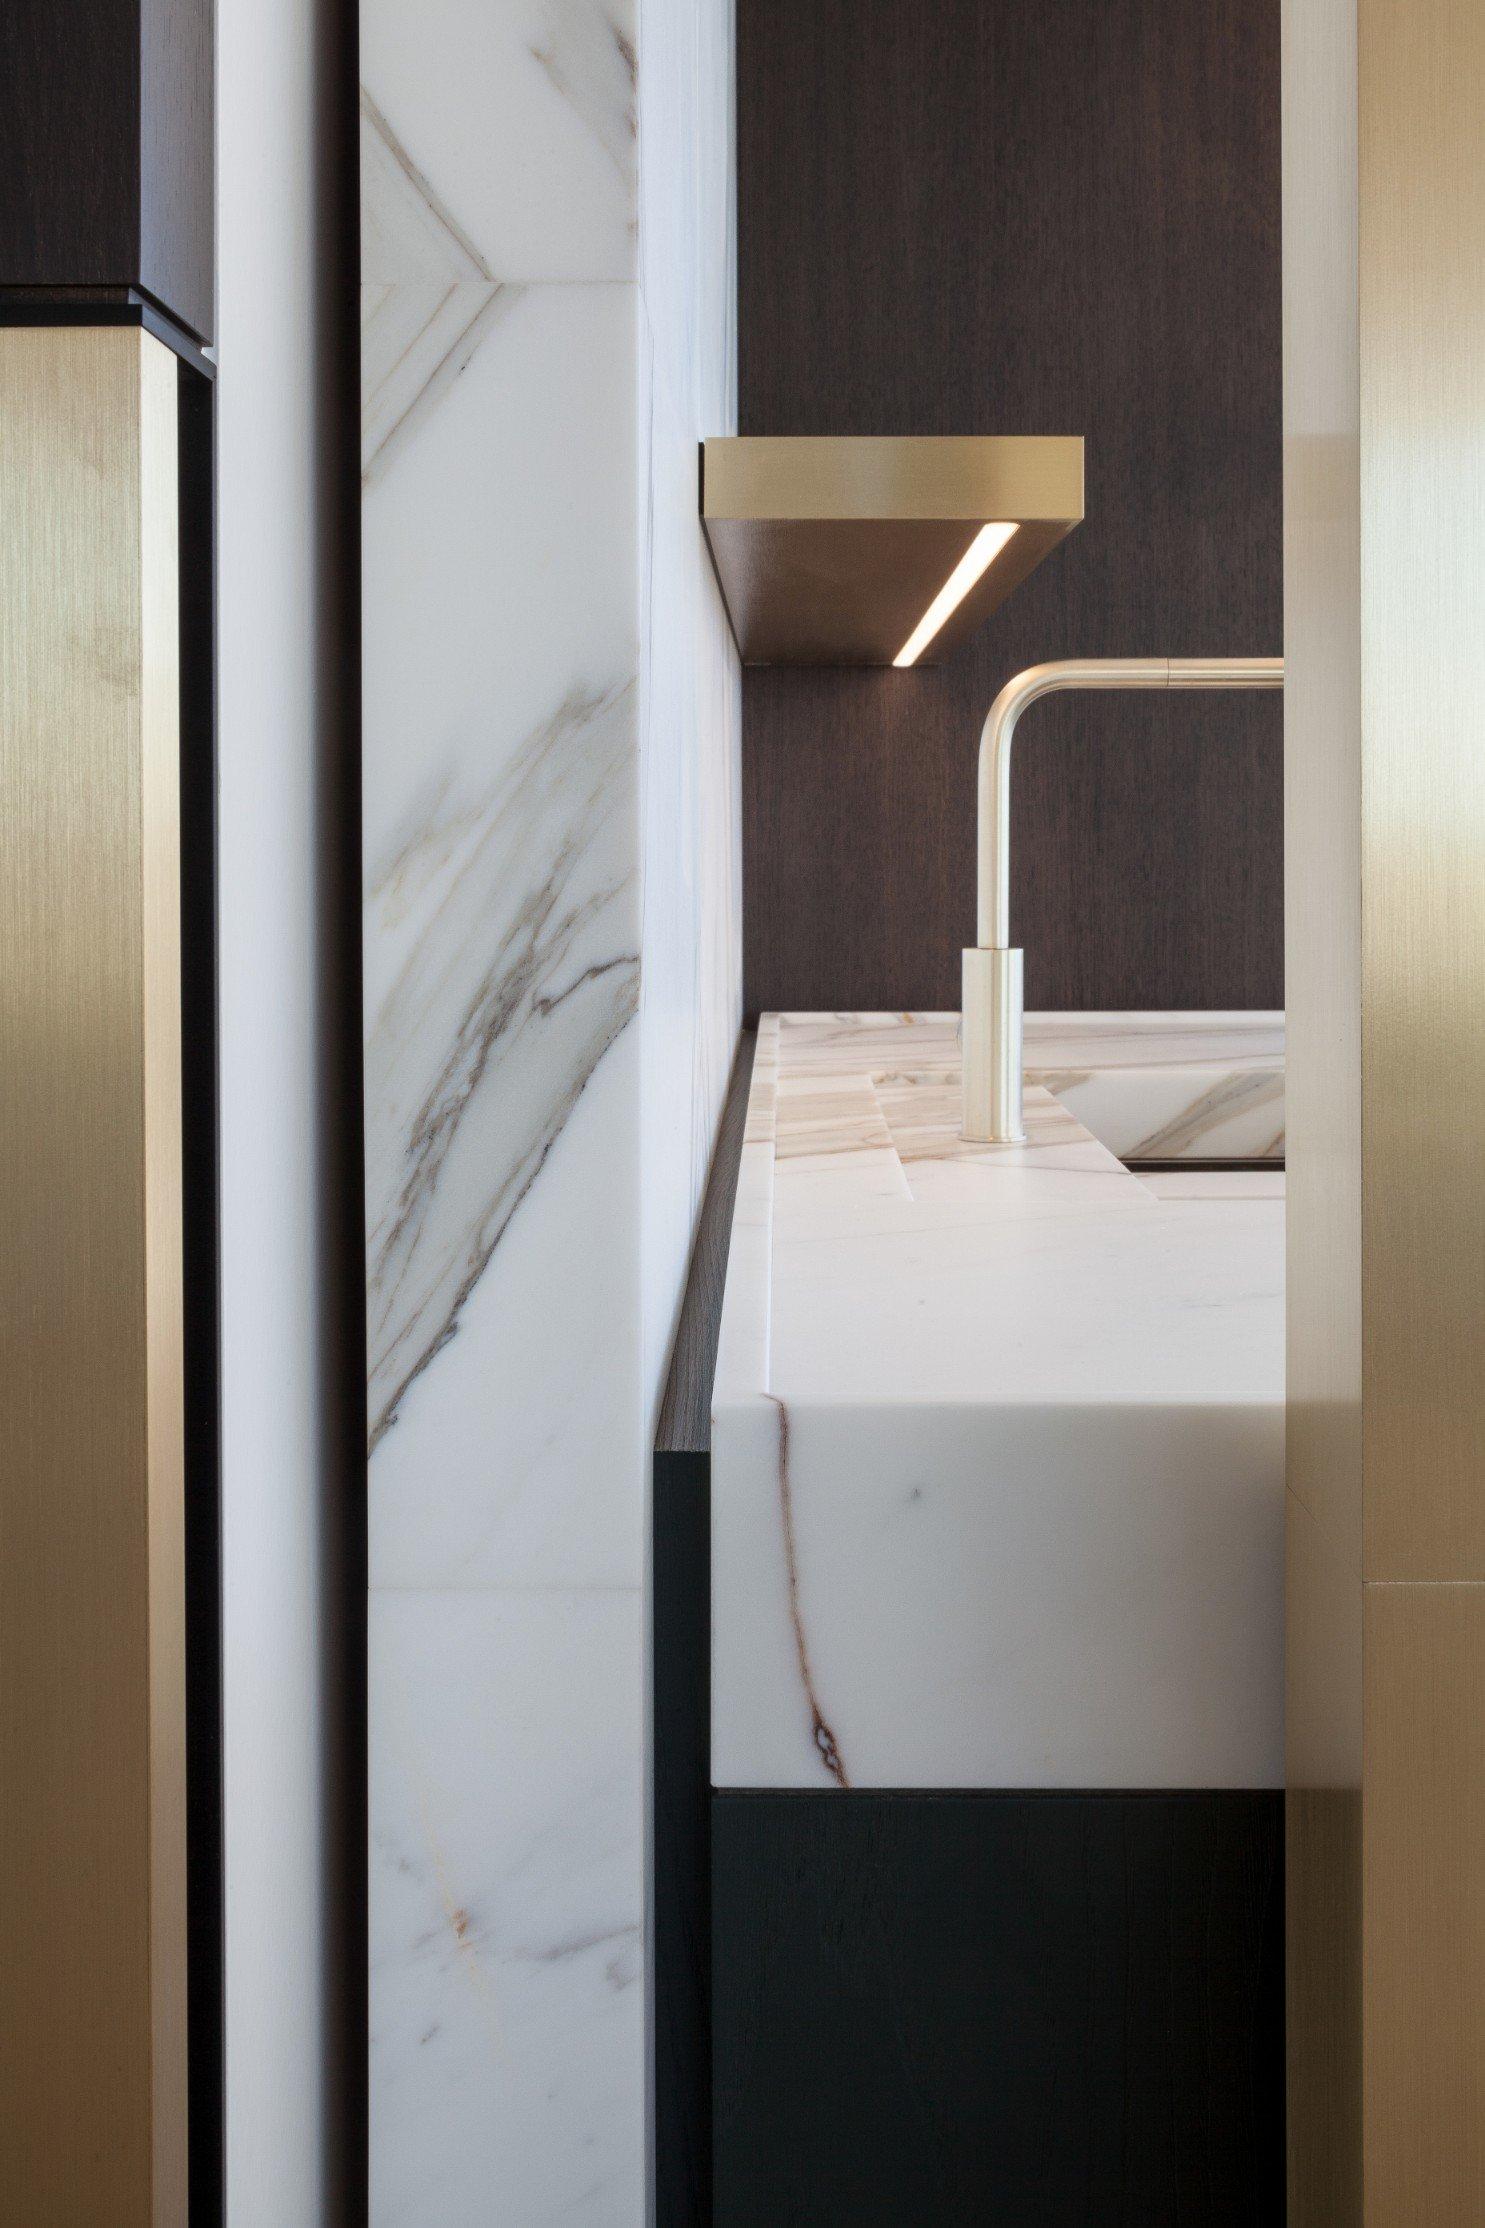 Rietveldprojects-penthouse-appartement-design-architectuur-kust43